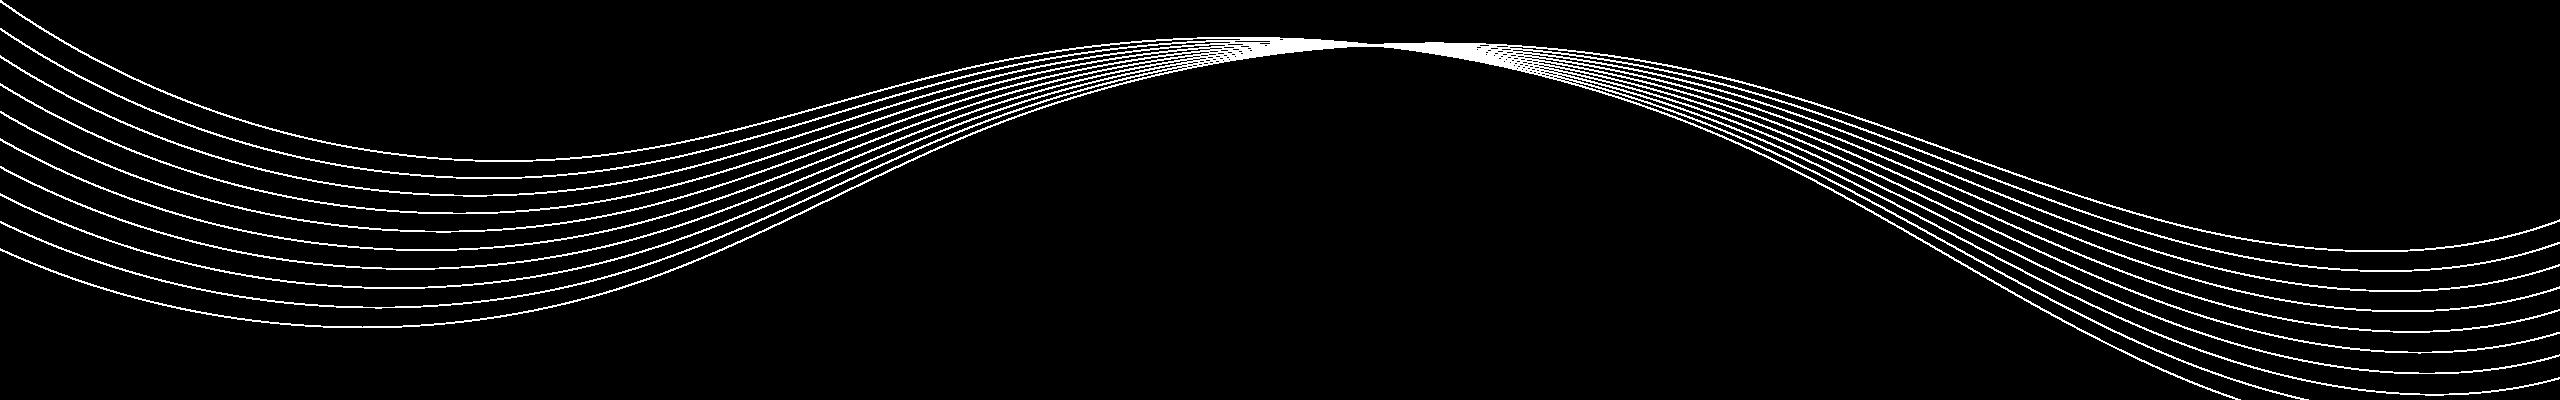 zumarte-pentagrama